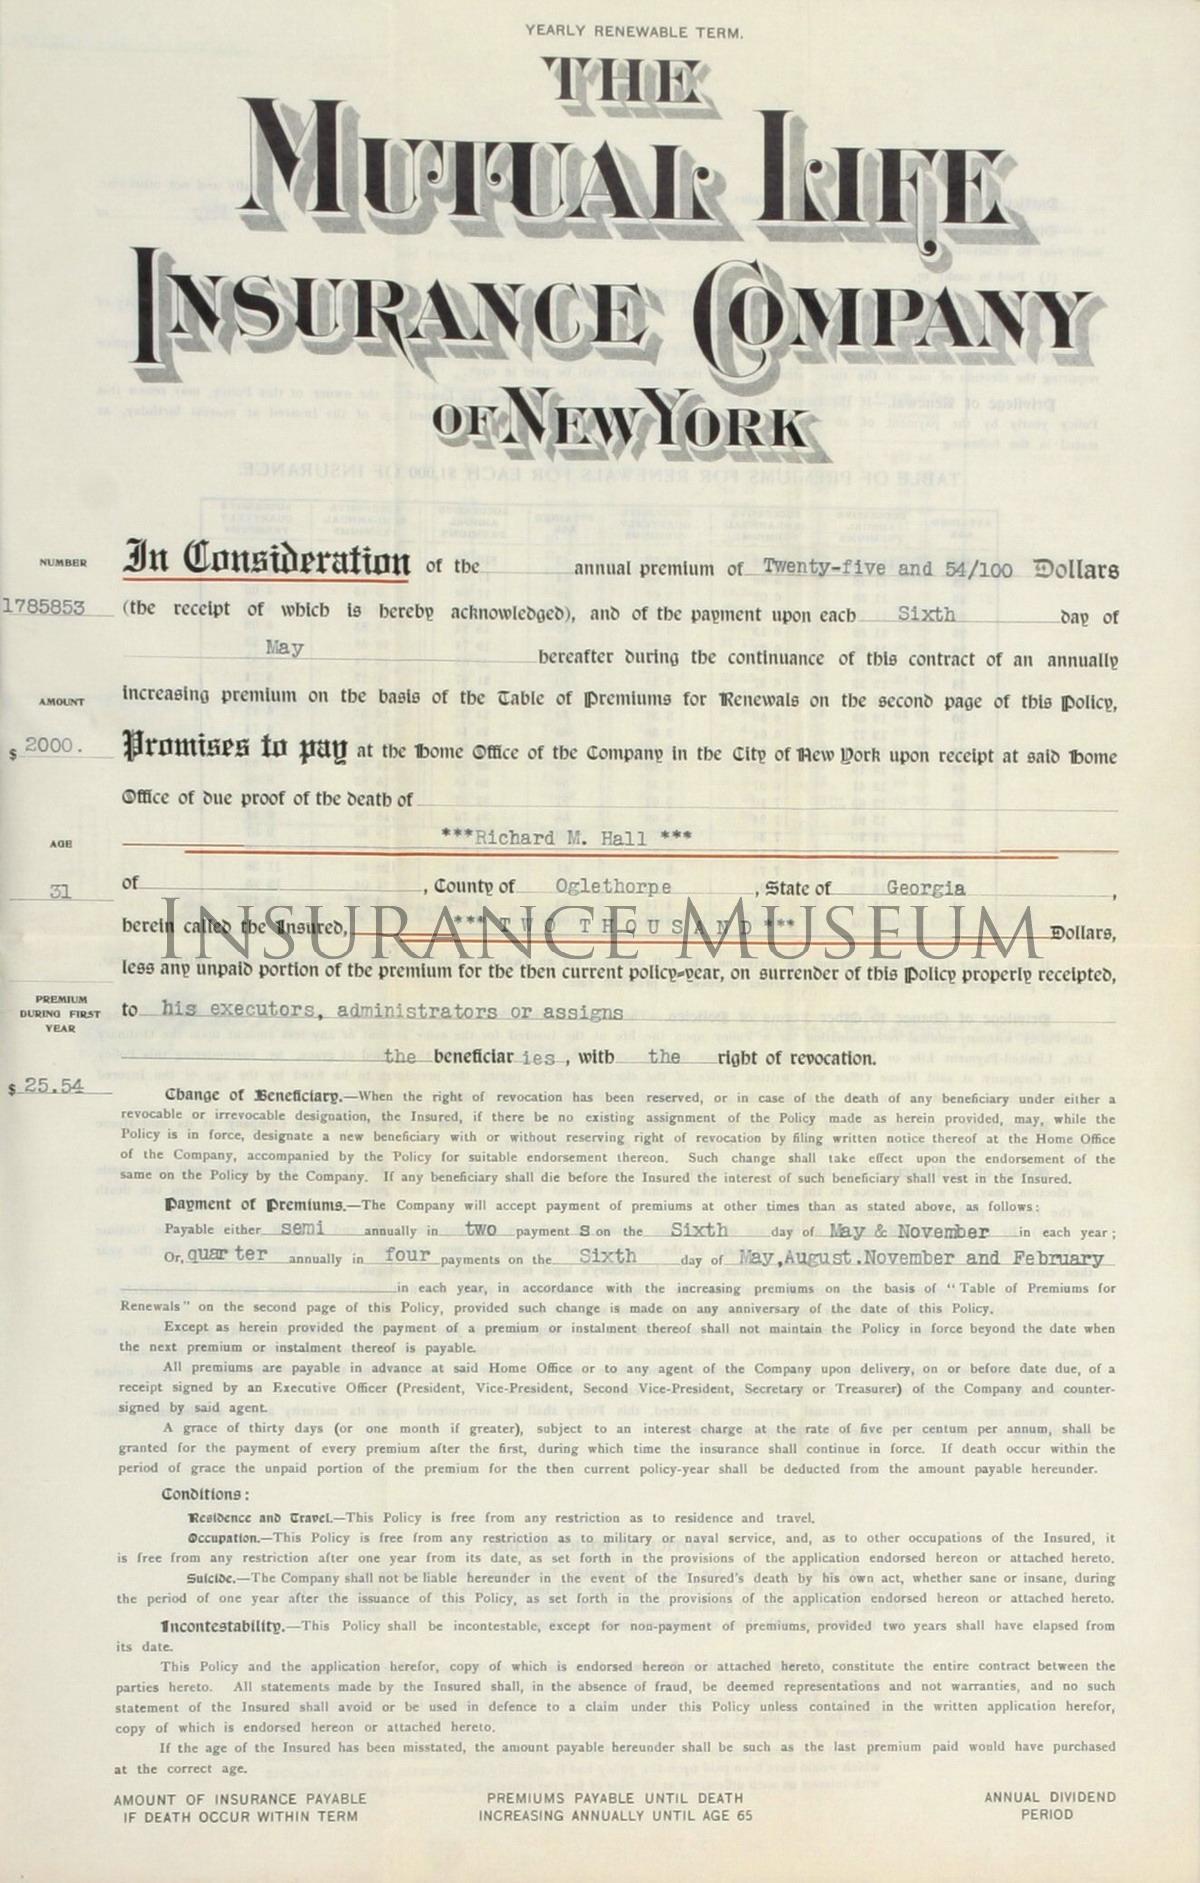 Mutual Life Insurance Company Of New York